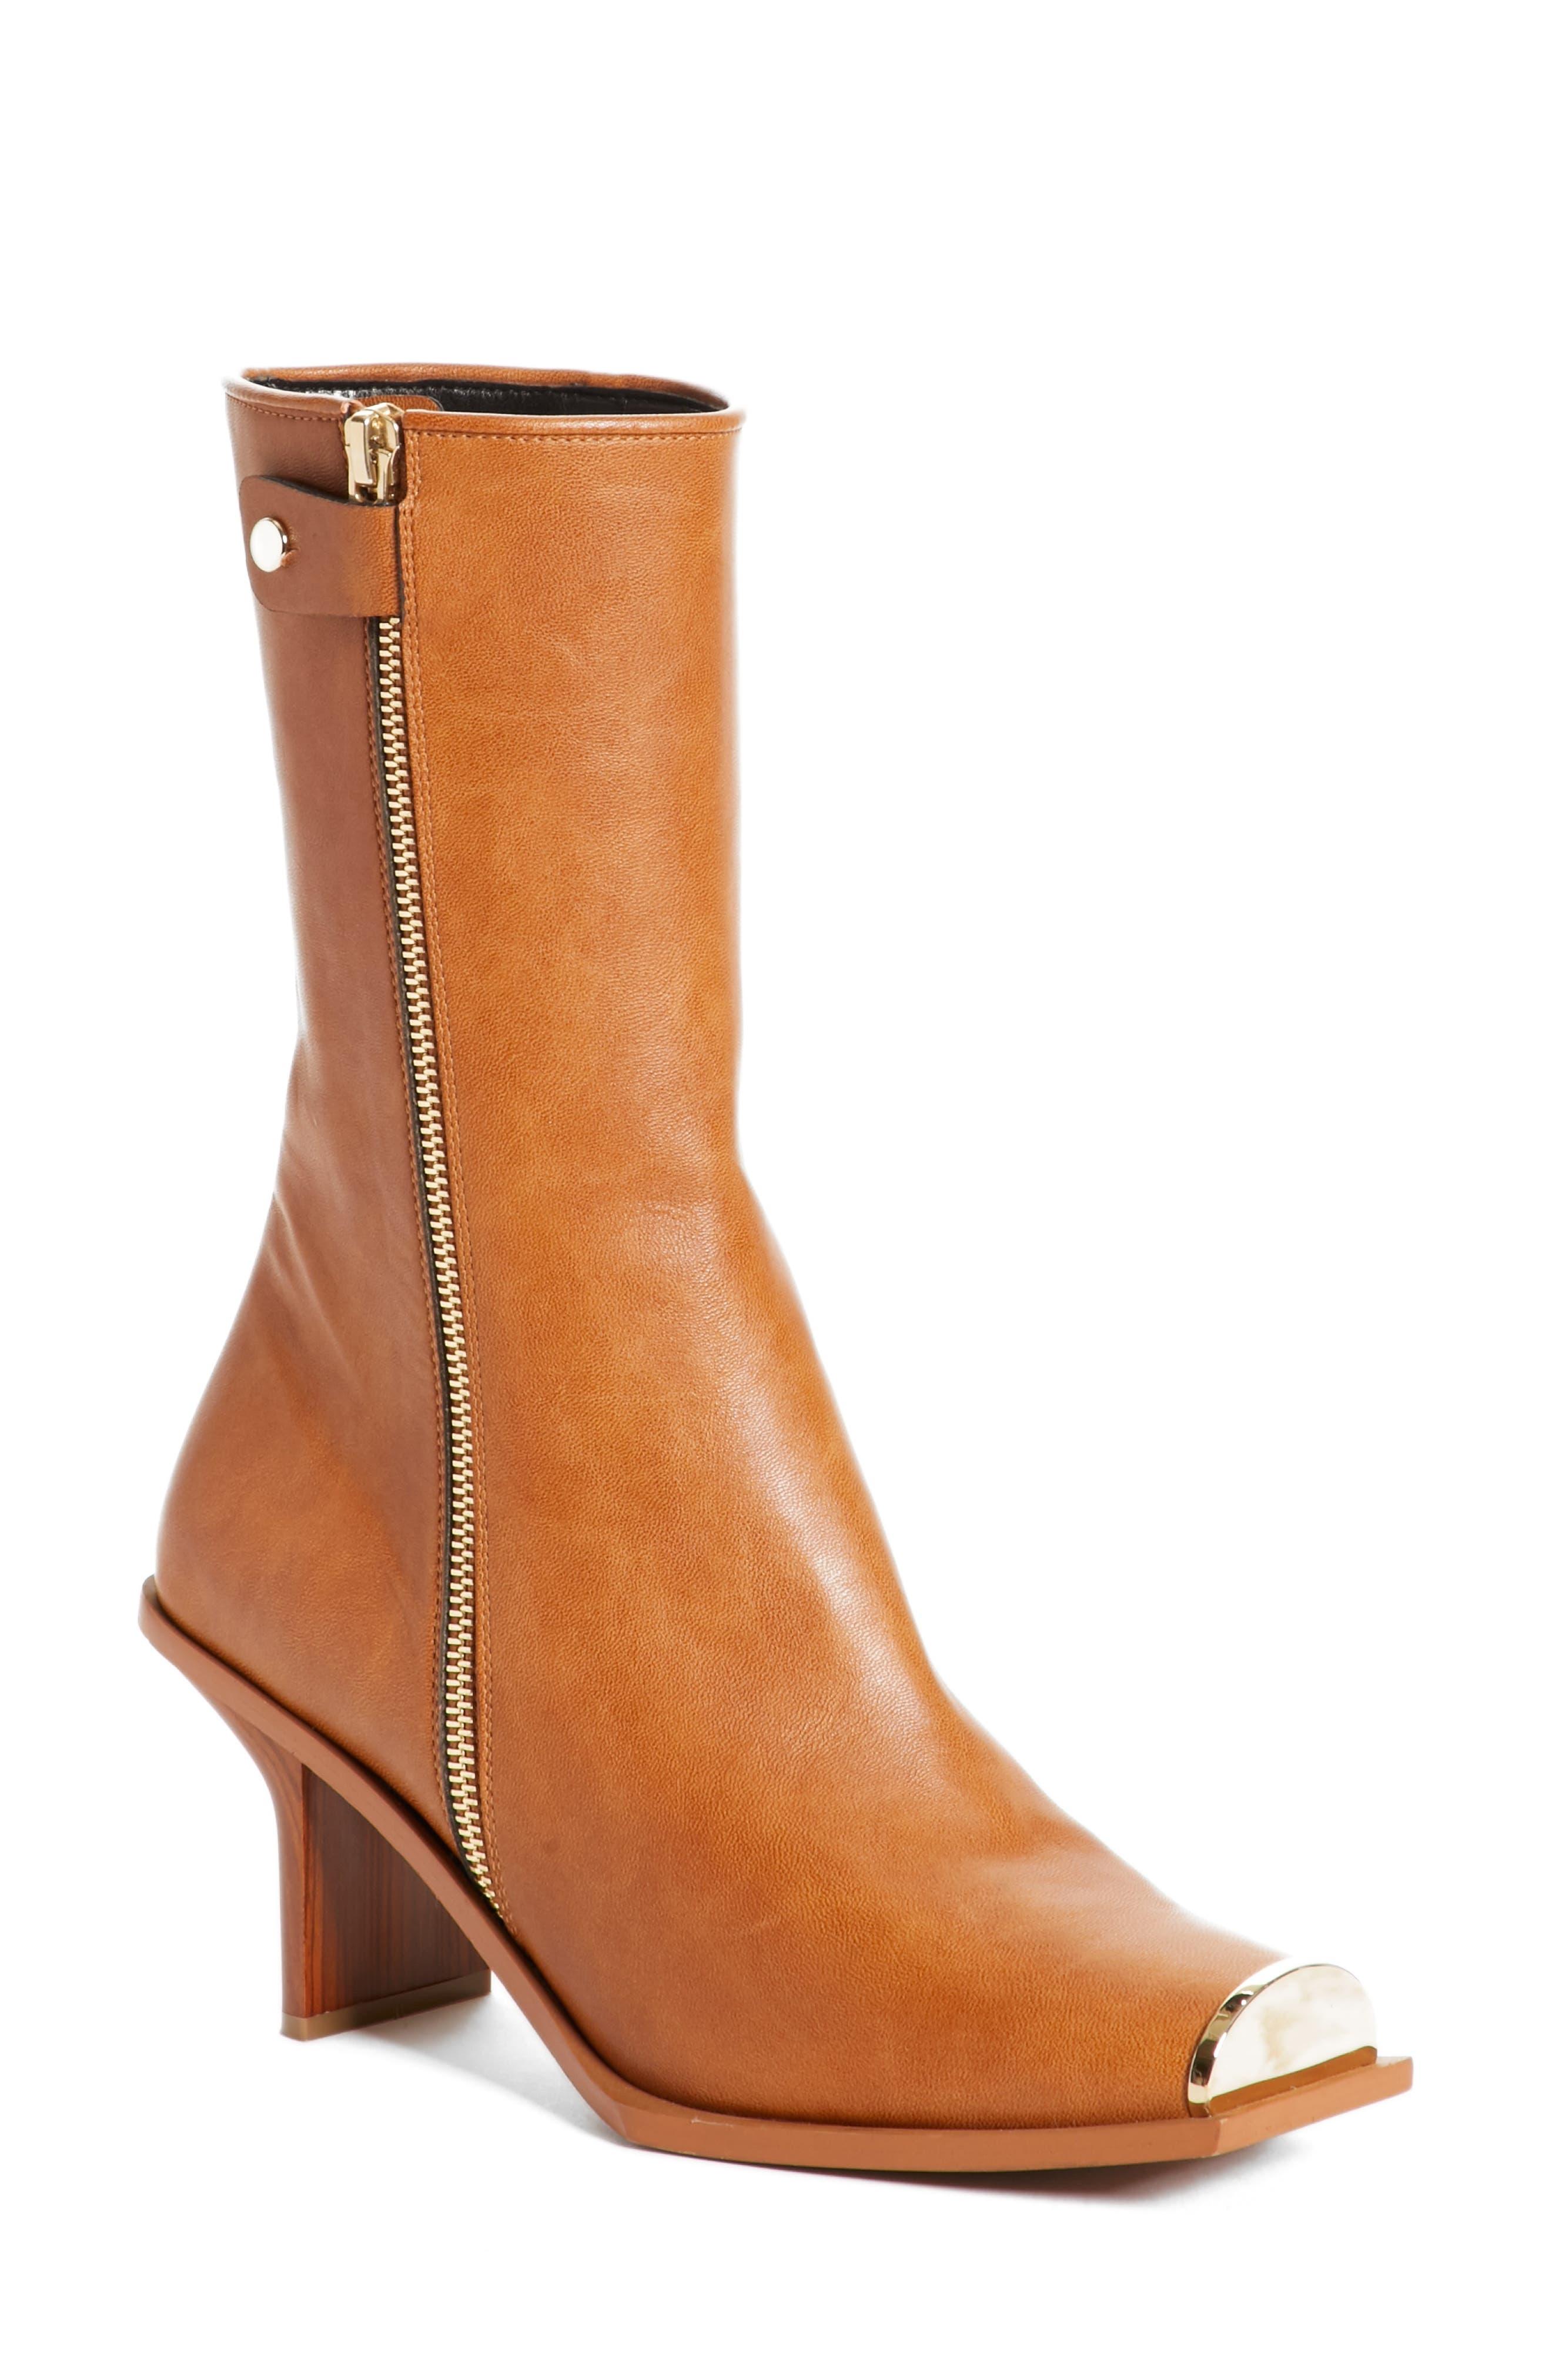 Alternate Image 1 Selected - Stella McCartney Cap Toe Boot (Women)